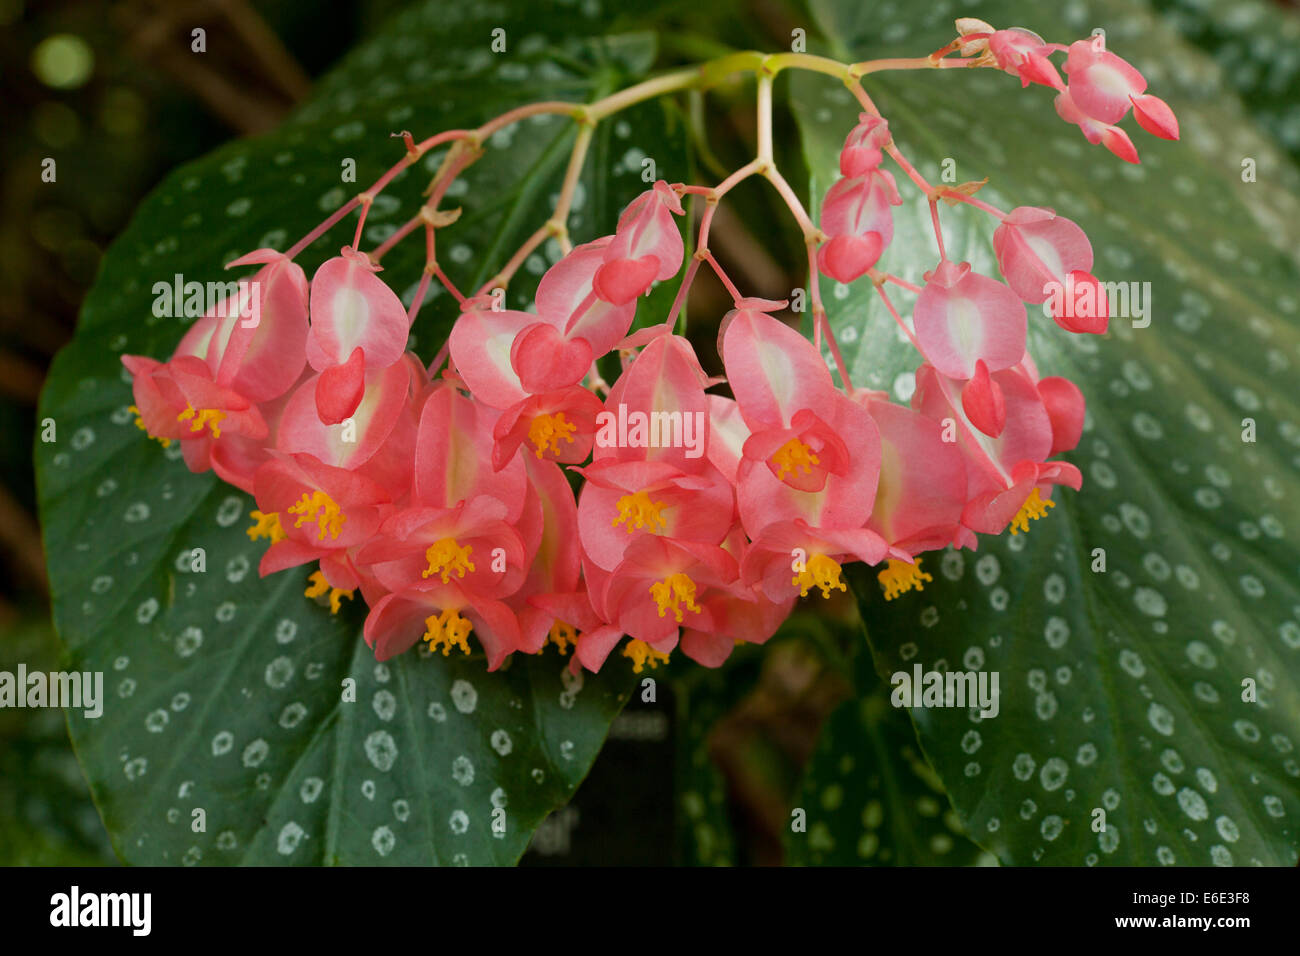 Juanita's Jewel begonia flowers - Stock Image